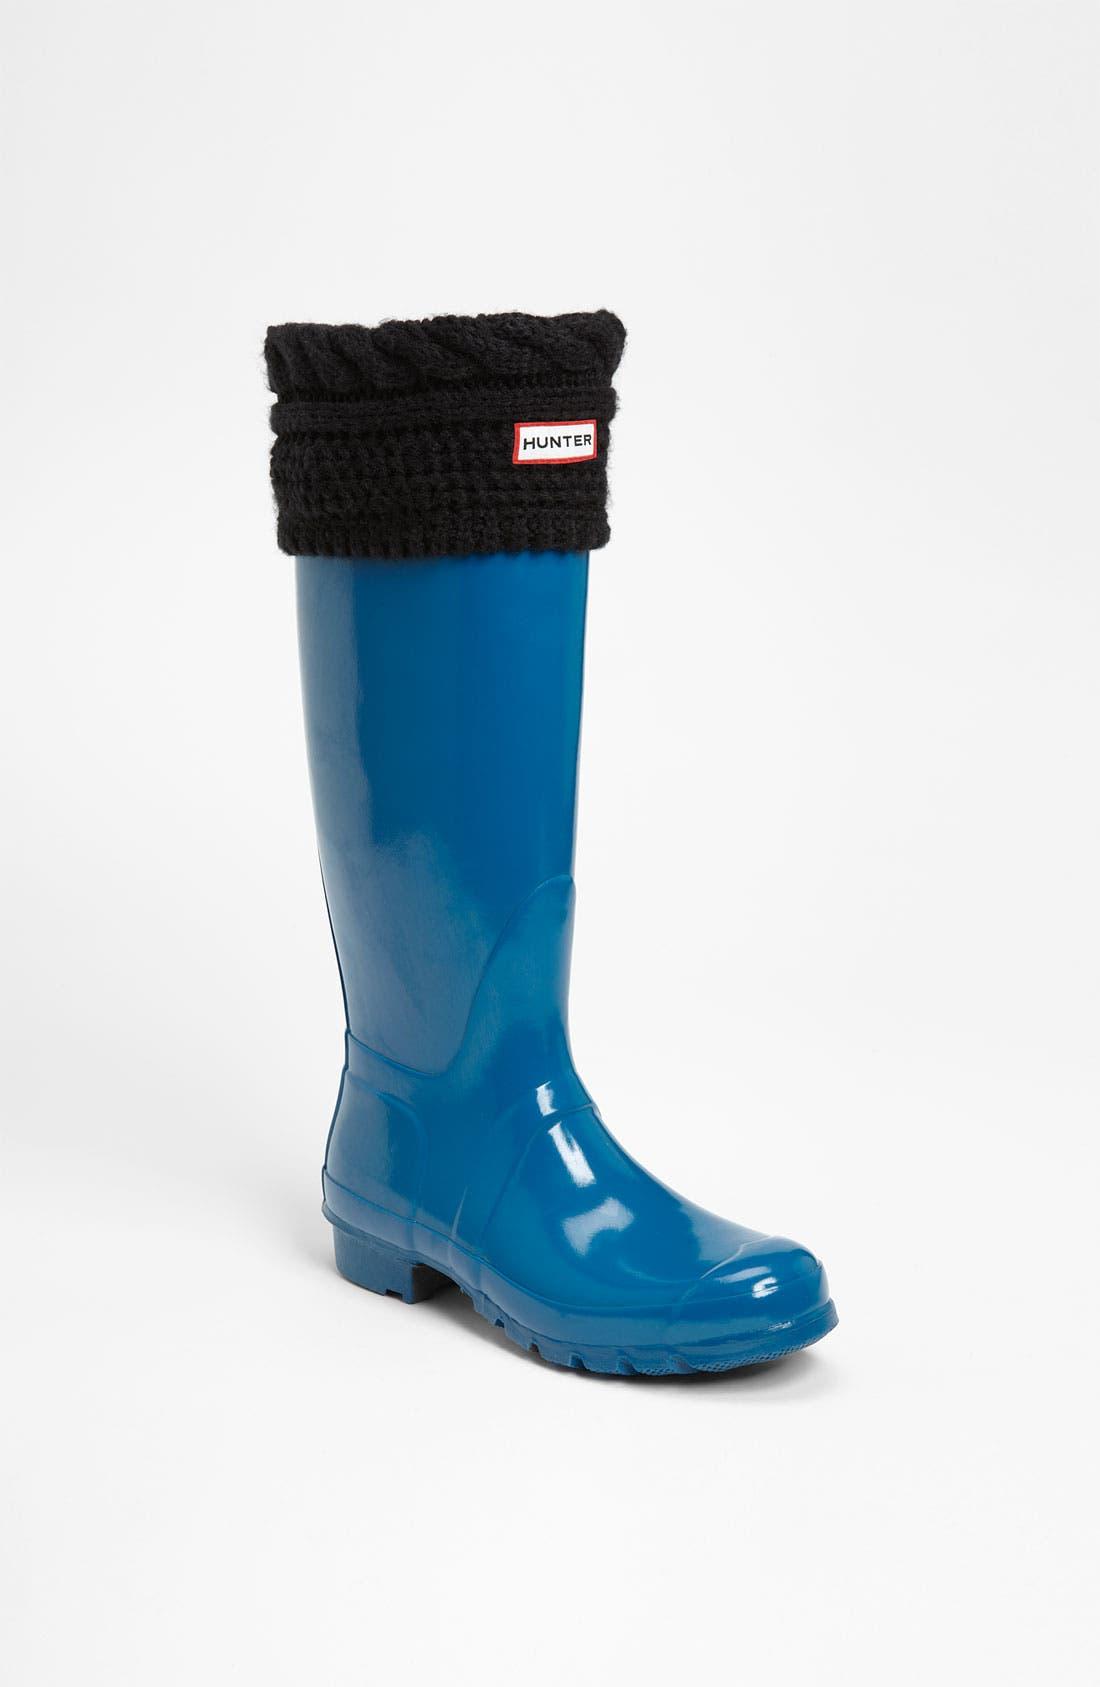 Main Image - Hunter Tall Gloss Rain Boot & Cable Knit Cuff Welly Socks